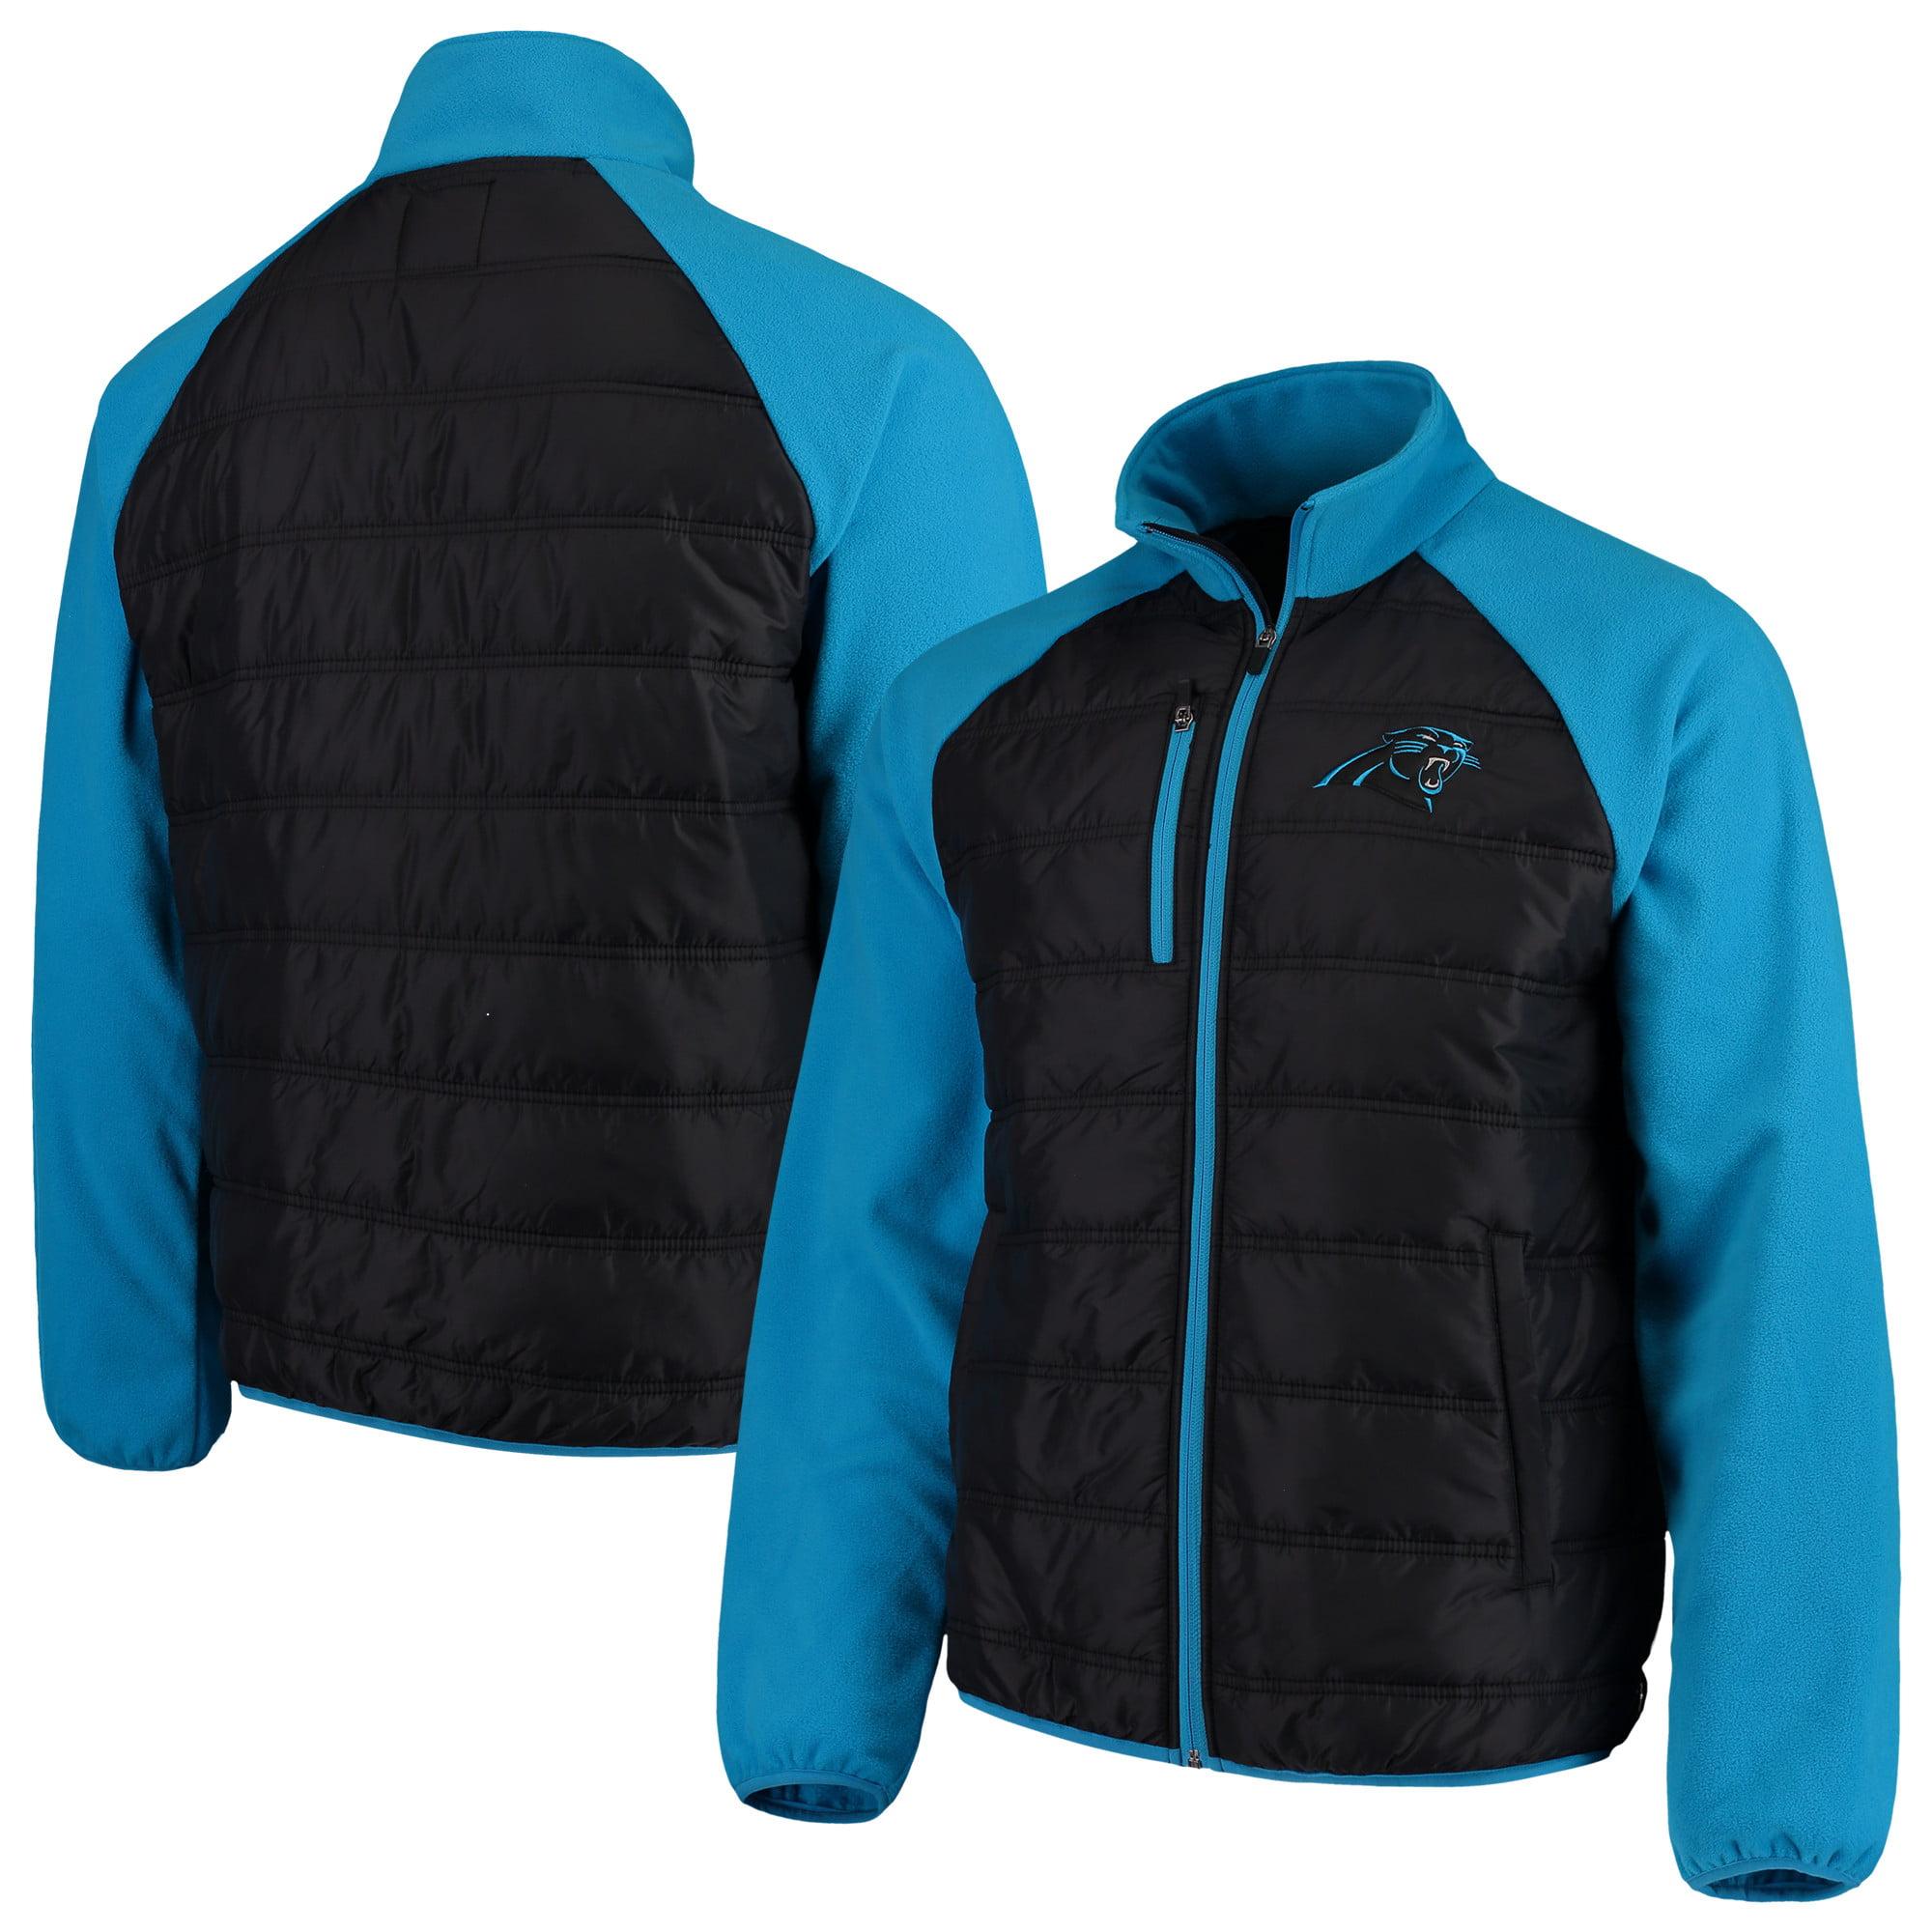 Carolina Panthers G-III Sports by Carl Banks Reinforcer Full-Zip Jacket - Black/Blue